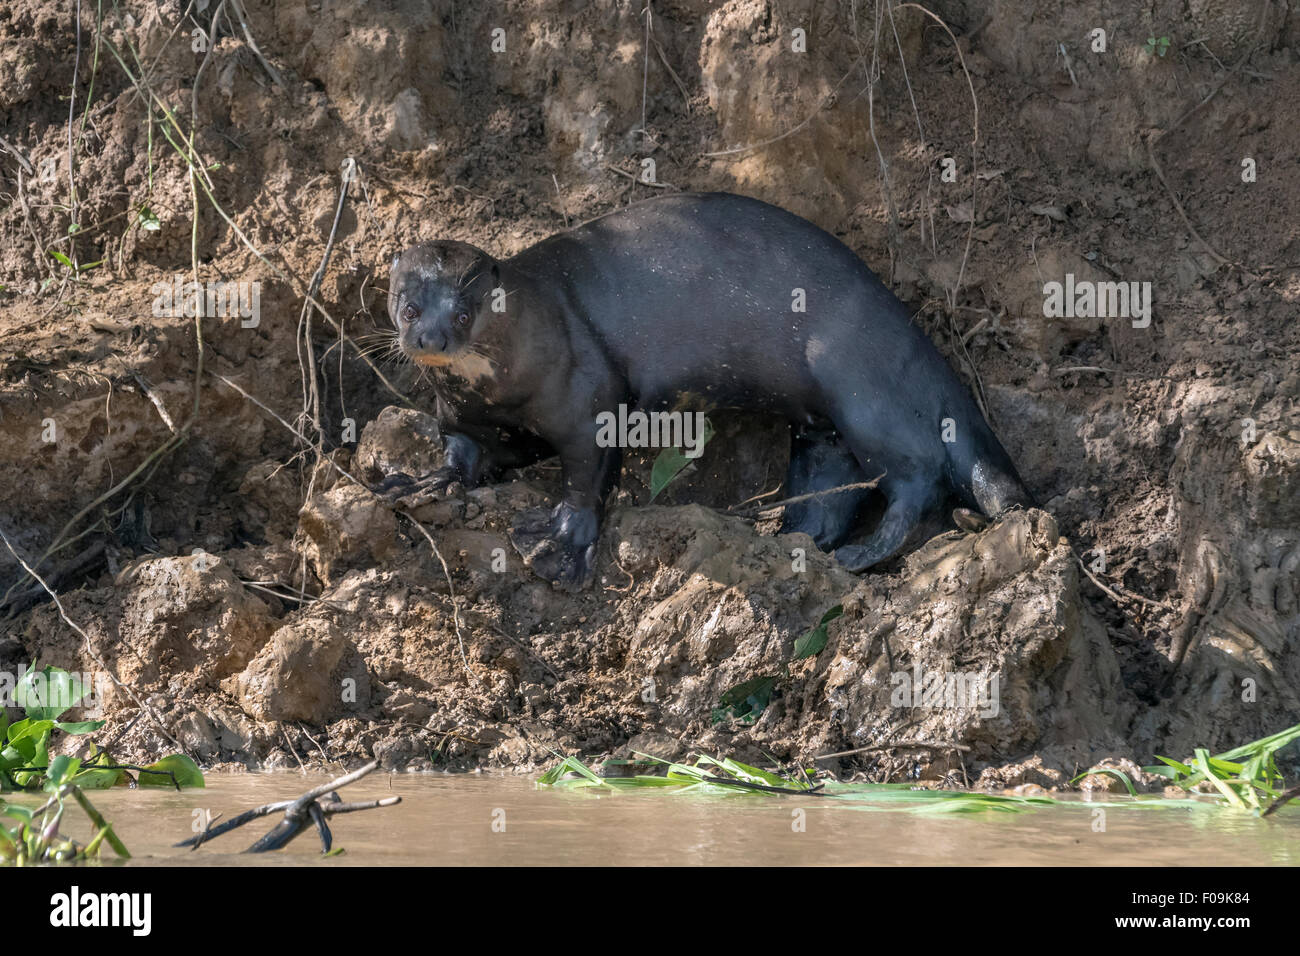 Riesigen Fluss Otter (Pteronura Brasiliensis) mit großen Schwimmhäuten, Rio Cuiabá, Pantanal, Brasilien Stockbild